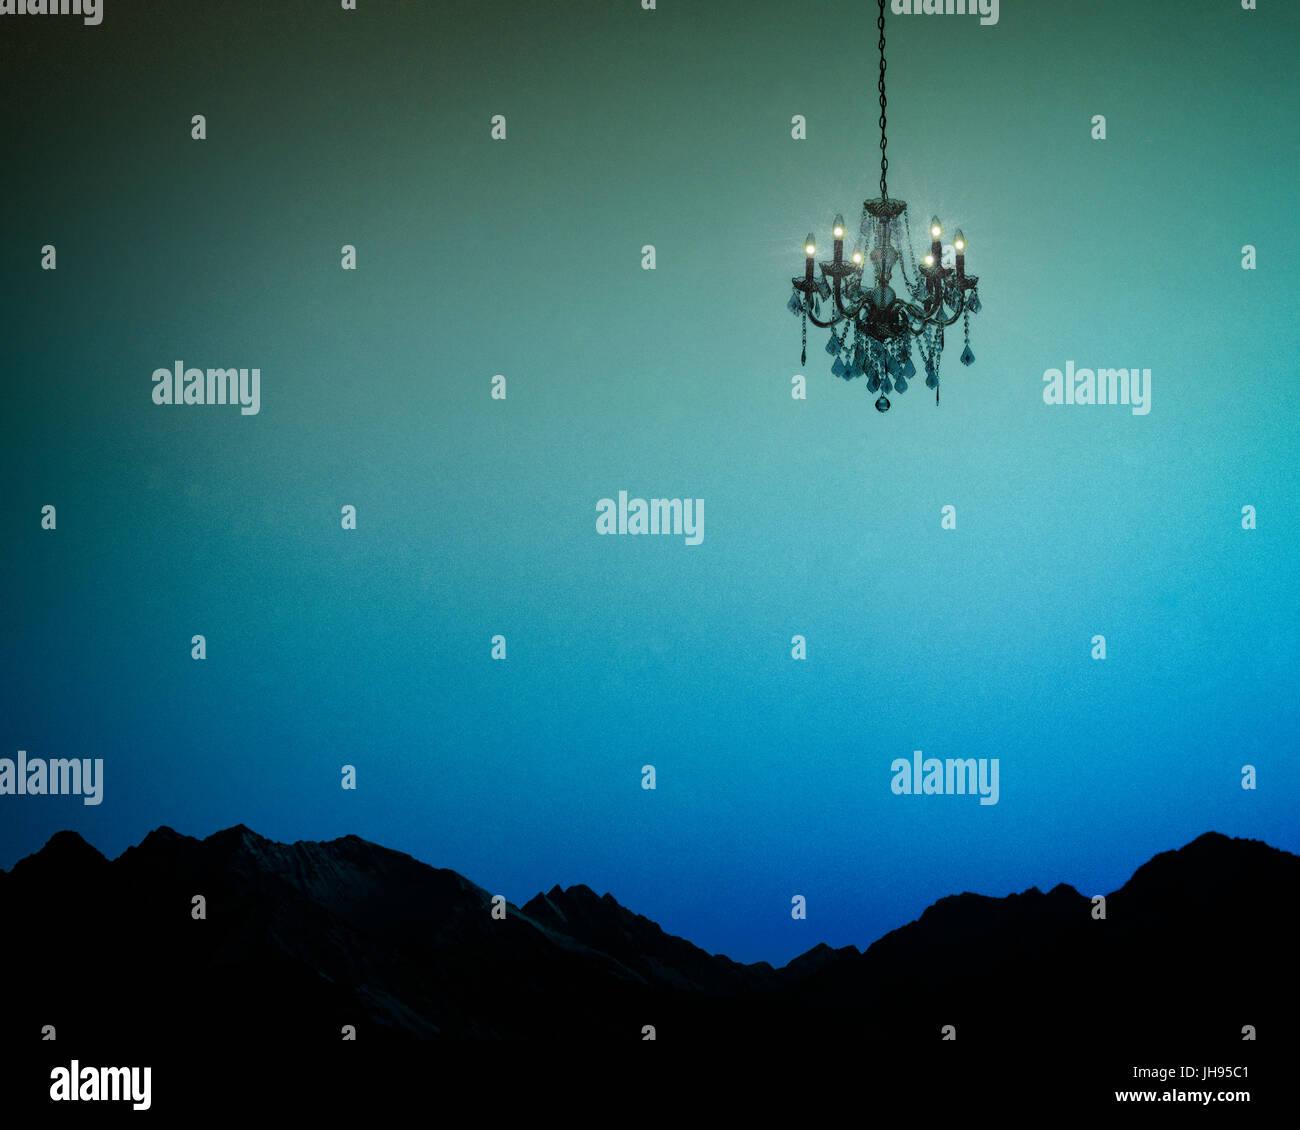 BOOK COVER CONCEPT: Nightlight - Stock Image